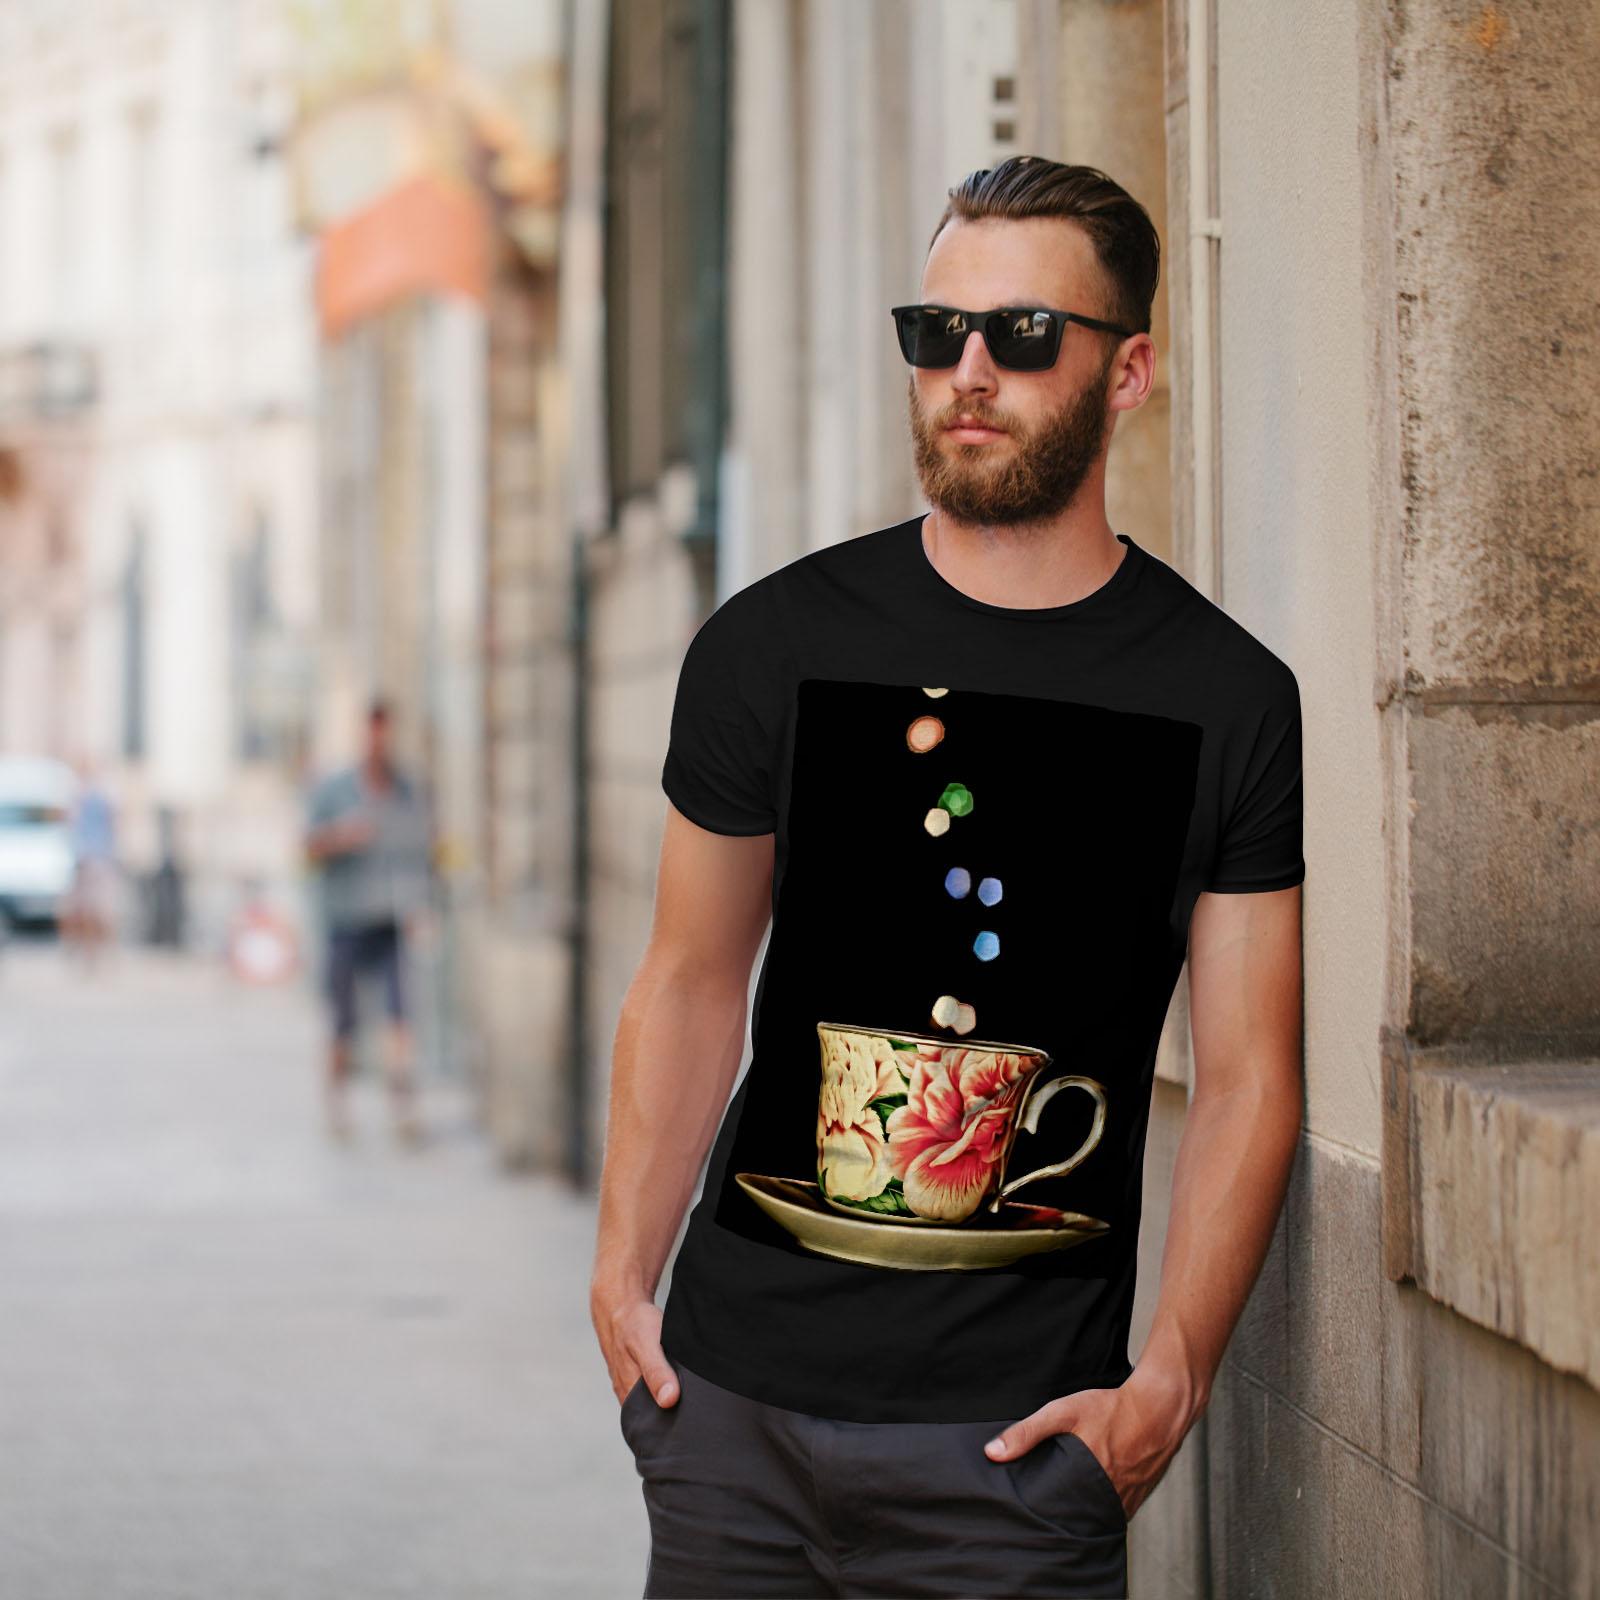 Wellcoda-Tea-Cup-Retro-Old-Mens-T-shirt-Smell-Graphic-Design-Printed-Tee thumbnail 5